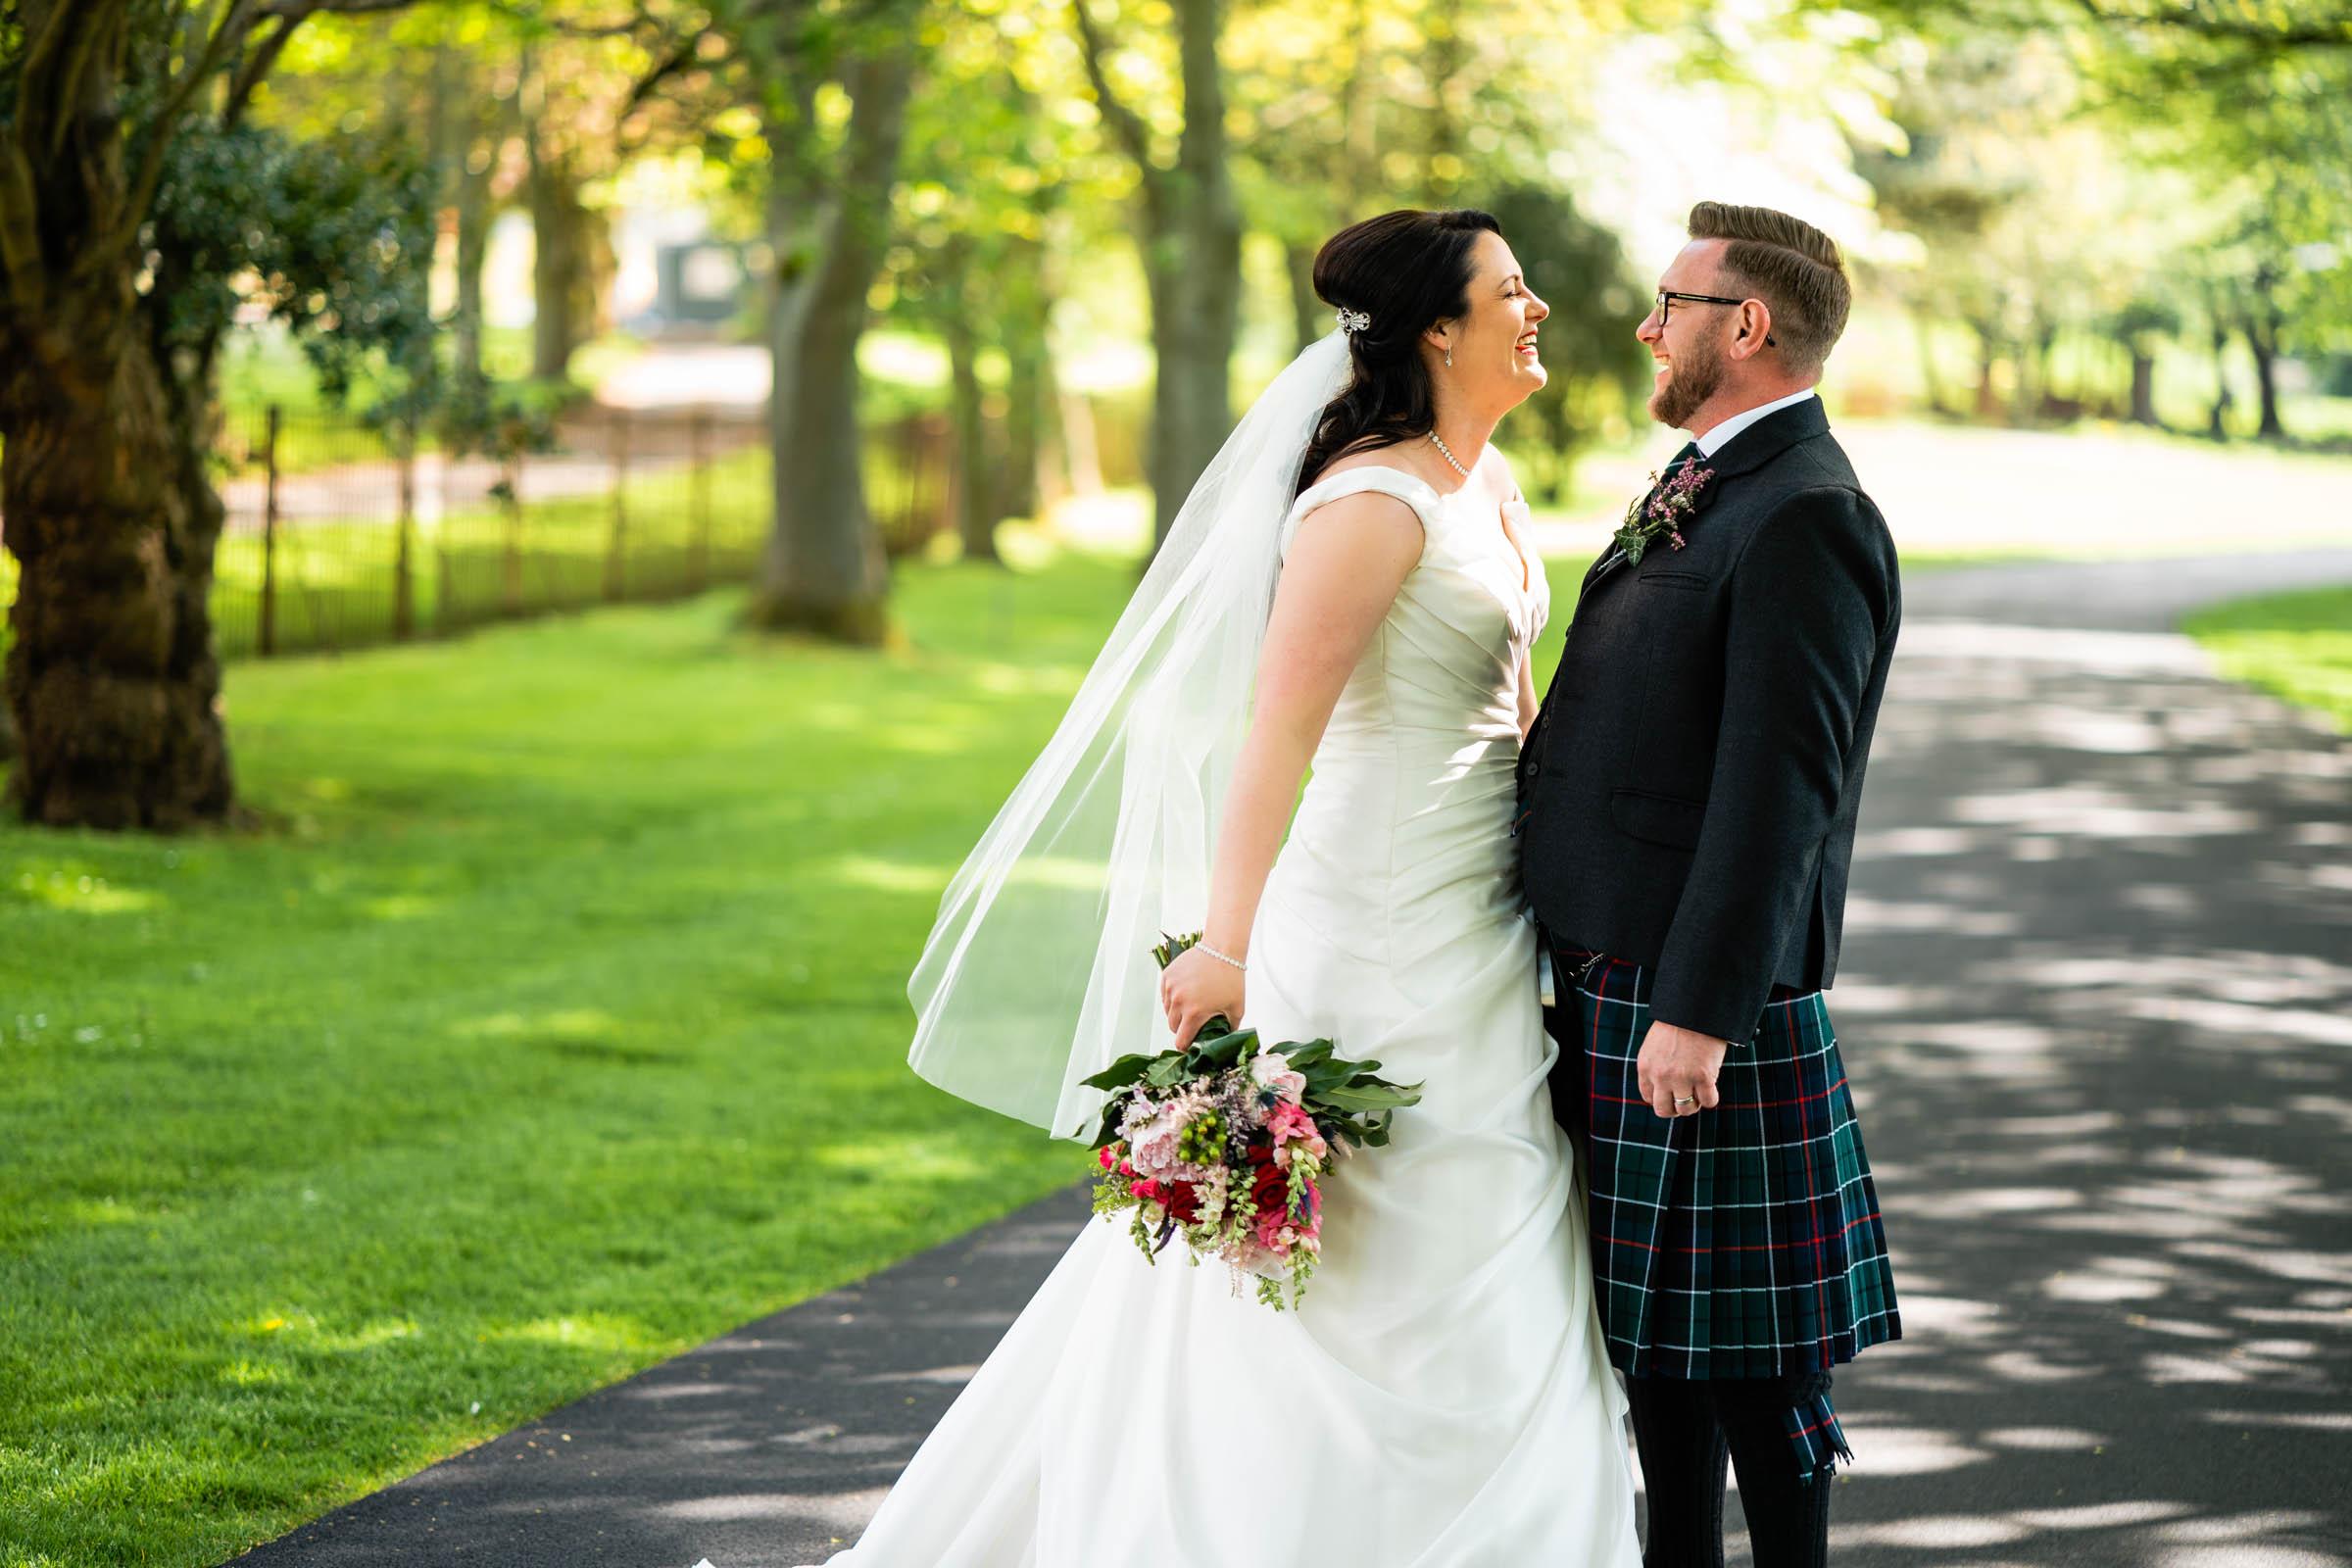 western-house-hotel-ayrshire-wedding-dearlyphotography (17 of 19).jpg